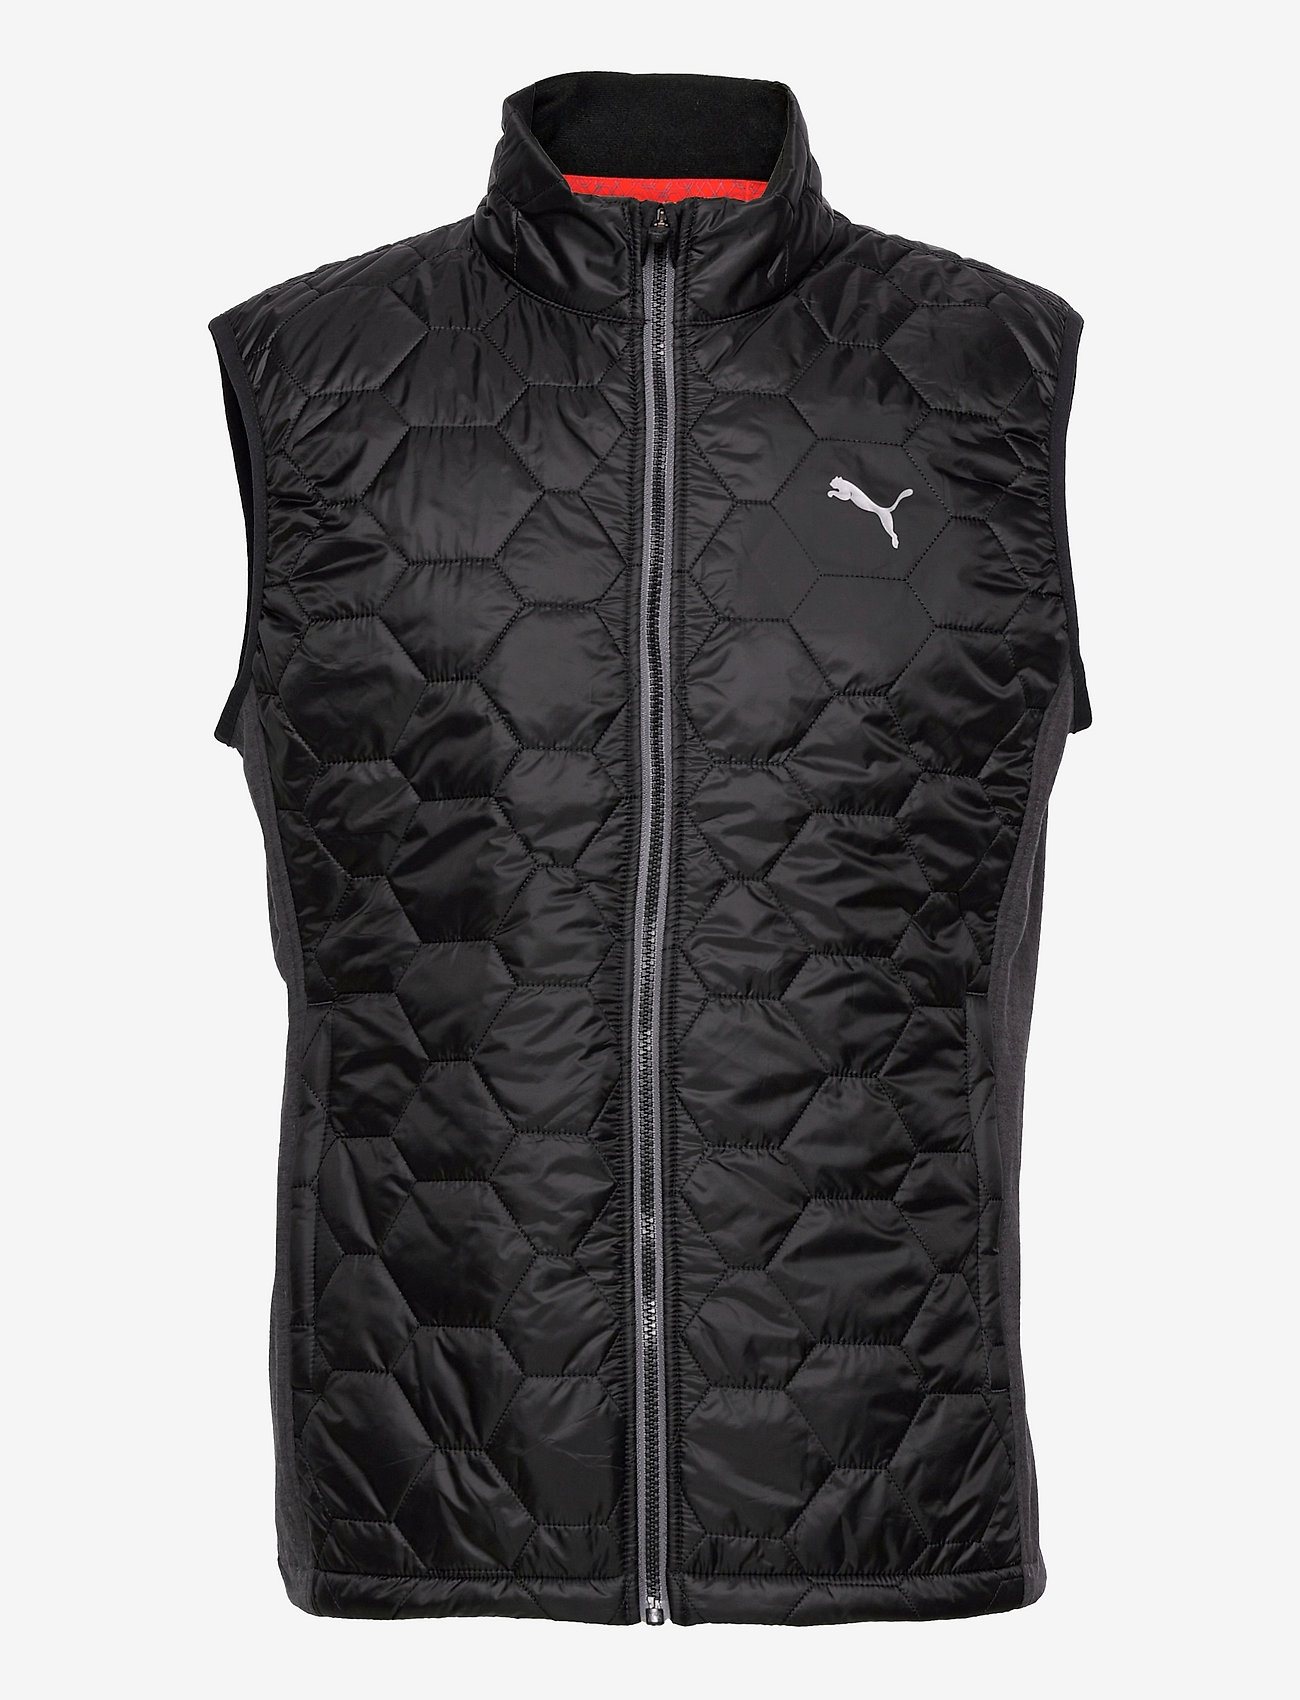 PUMA Golf - Cloudspun WRMLBL Vest - golf jackets - puma black - 0